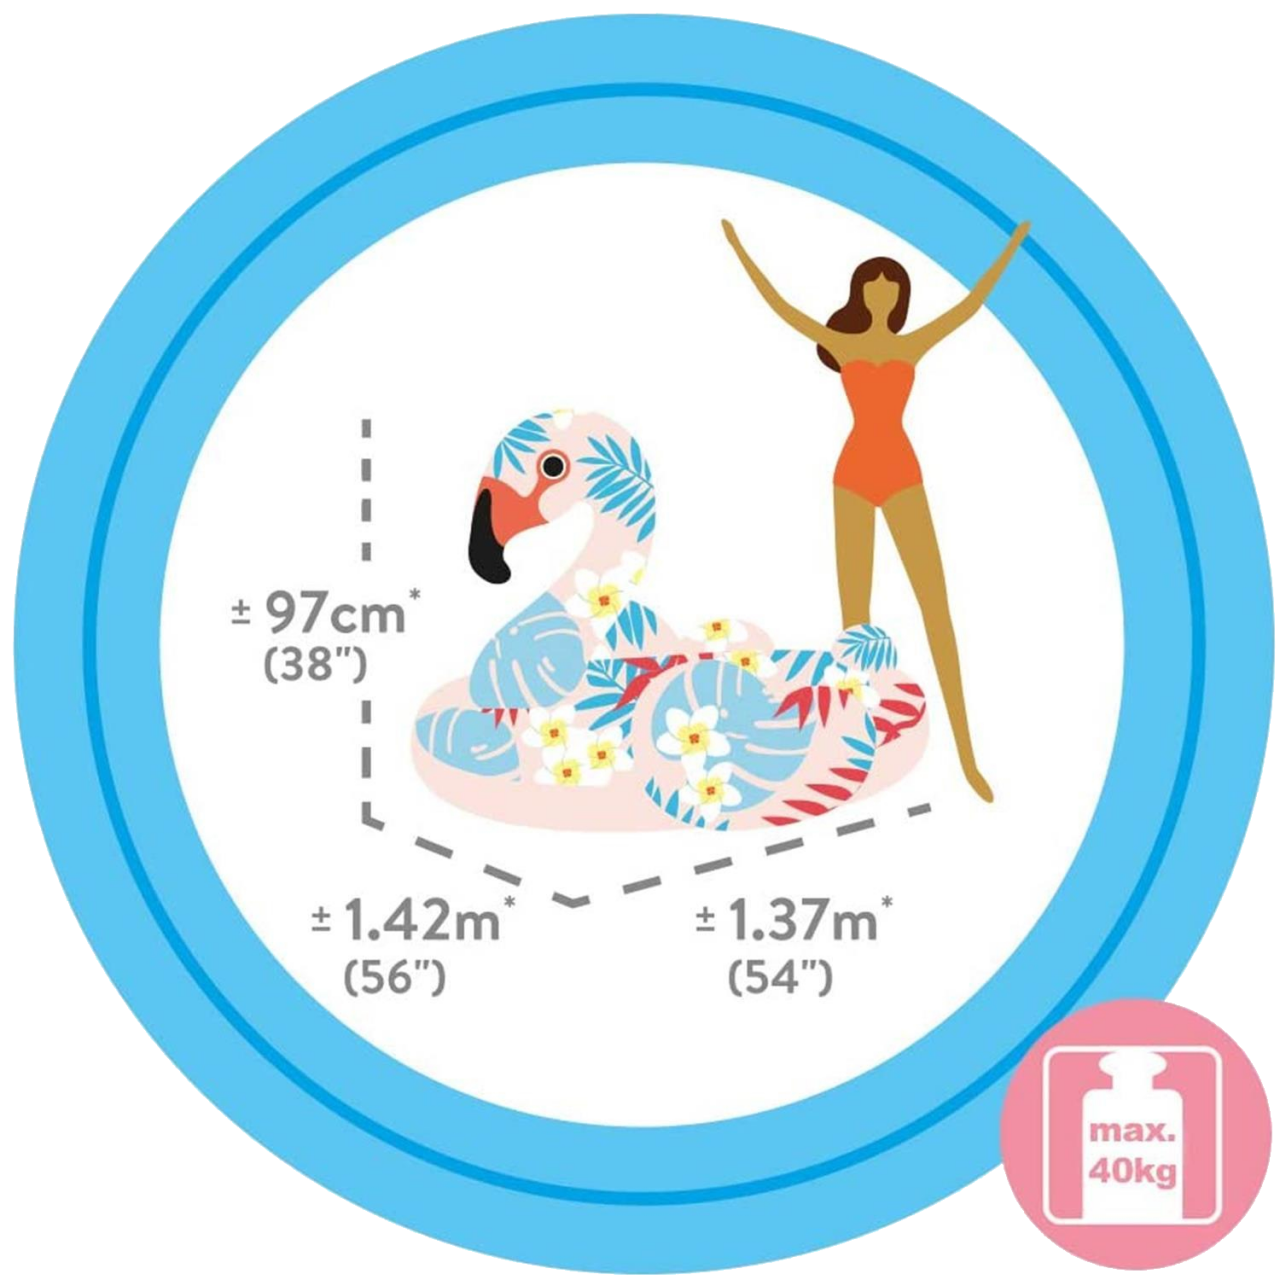 Intex Tropical Flamingo Badeinsel Schmimmliege Luftmatratze 142x137x97 cm 57559